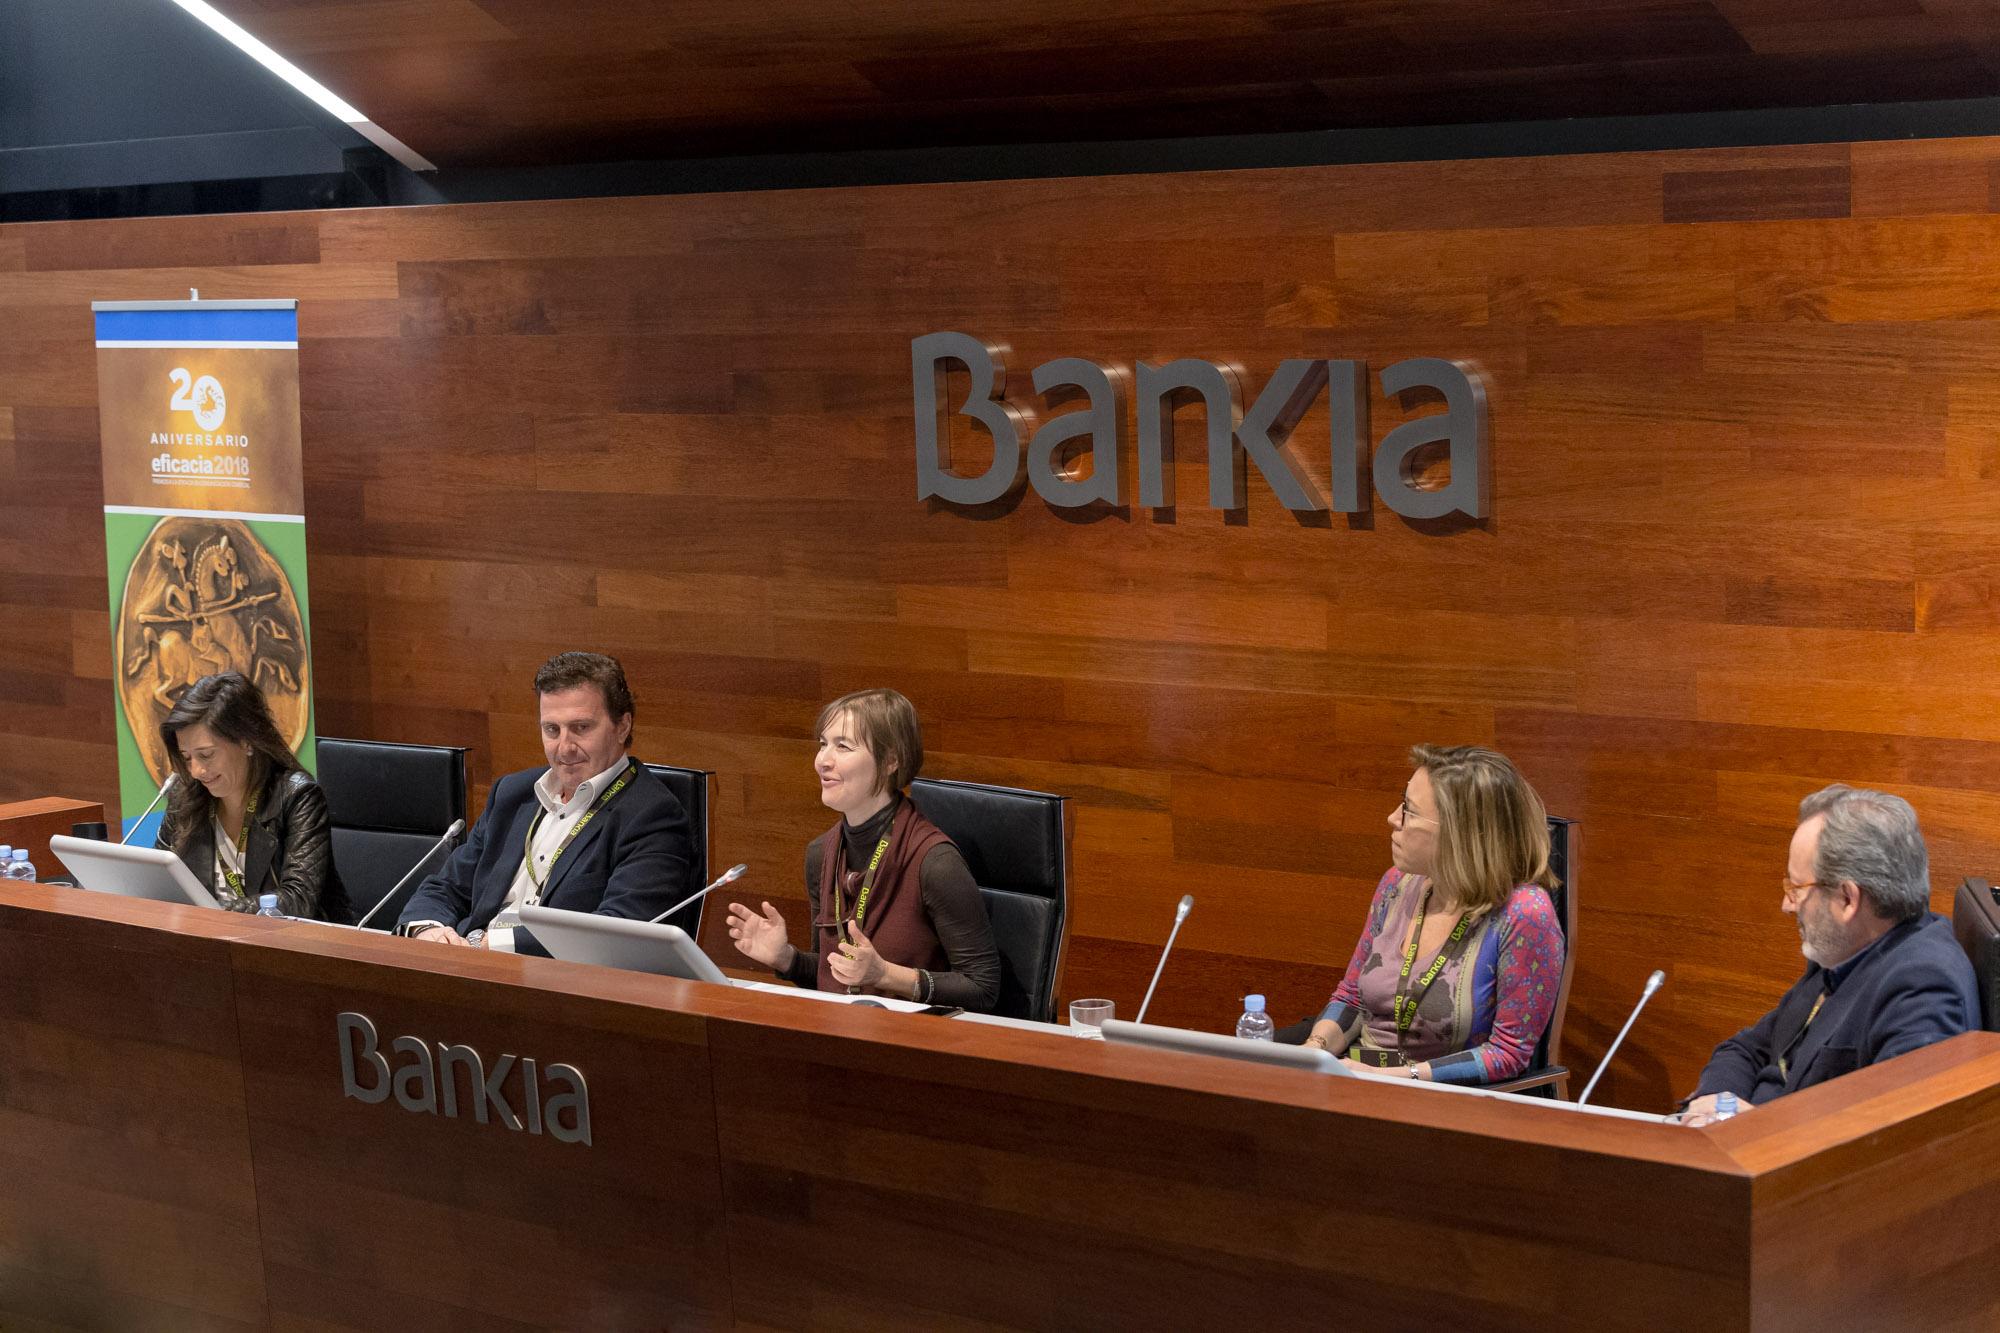 Mesa de debate. De izquierda a derecha Cristina Barbosa (Vodafone), Dante Cacciatore (Telefónica España), Nuria Serrano (APG Spain), Neus Martínez (Nestlé España) y Jaime Lobera (Campofrío Food Group)